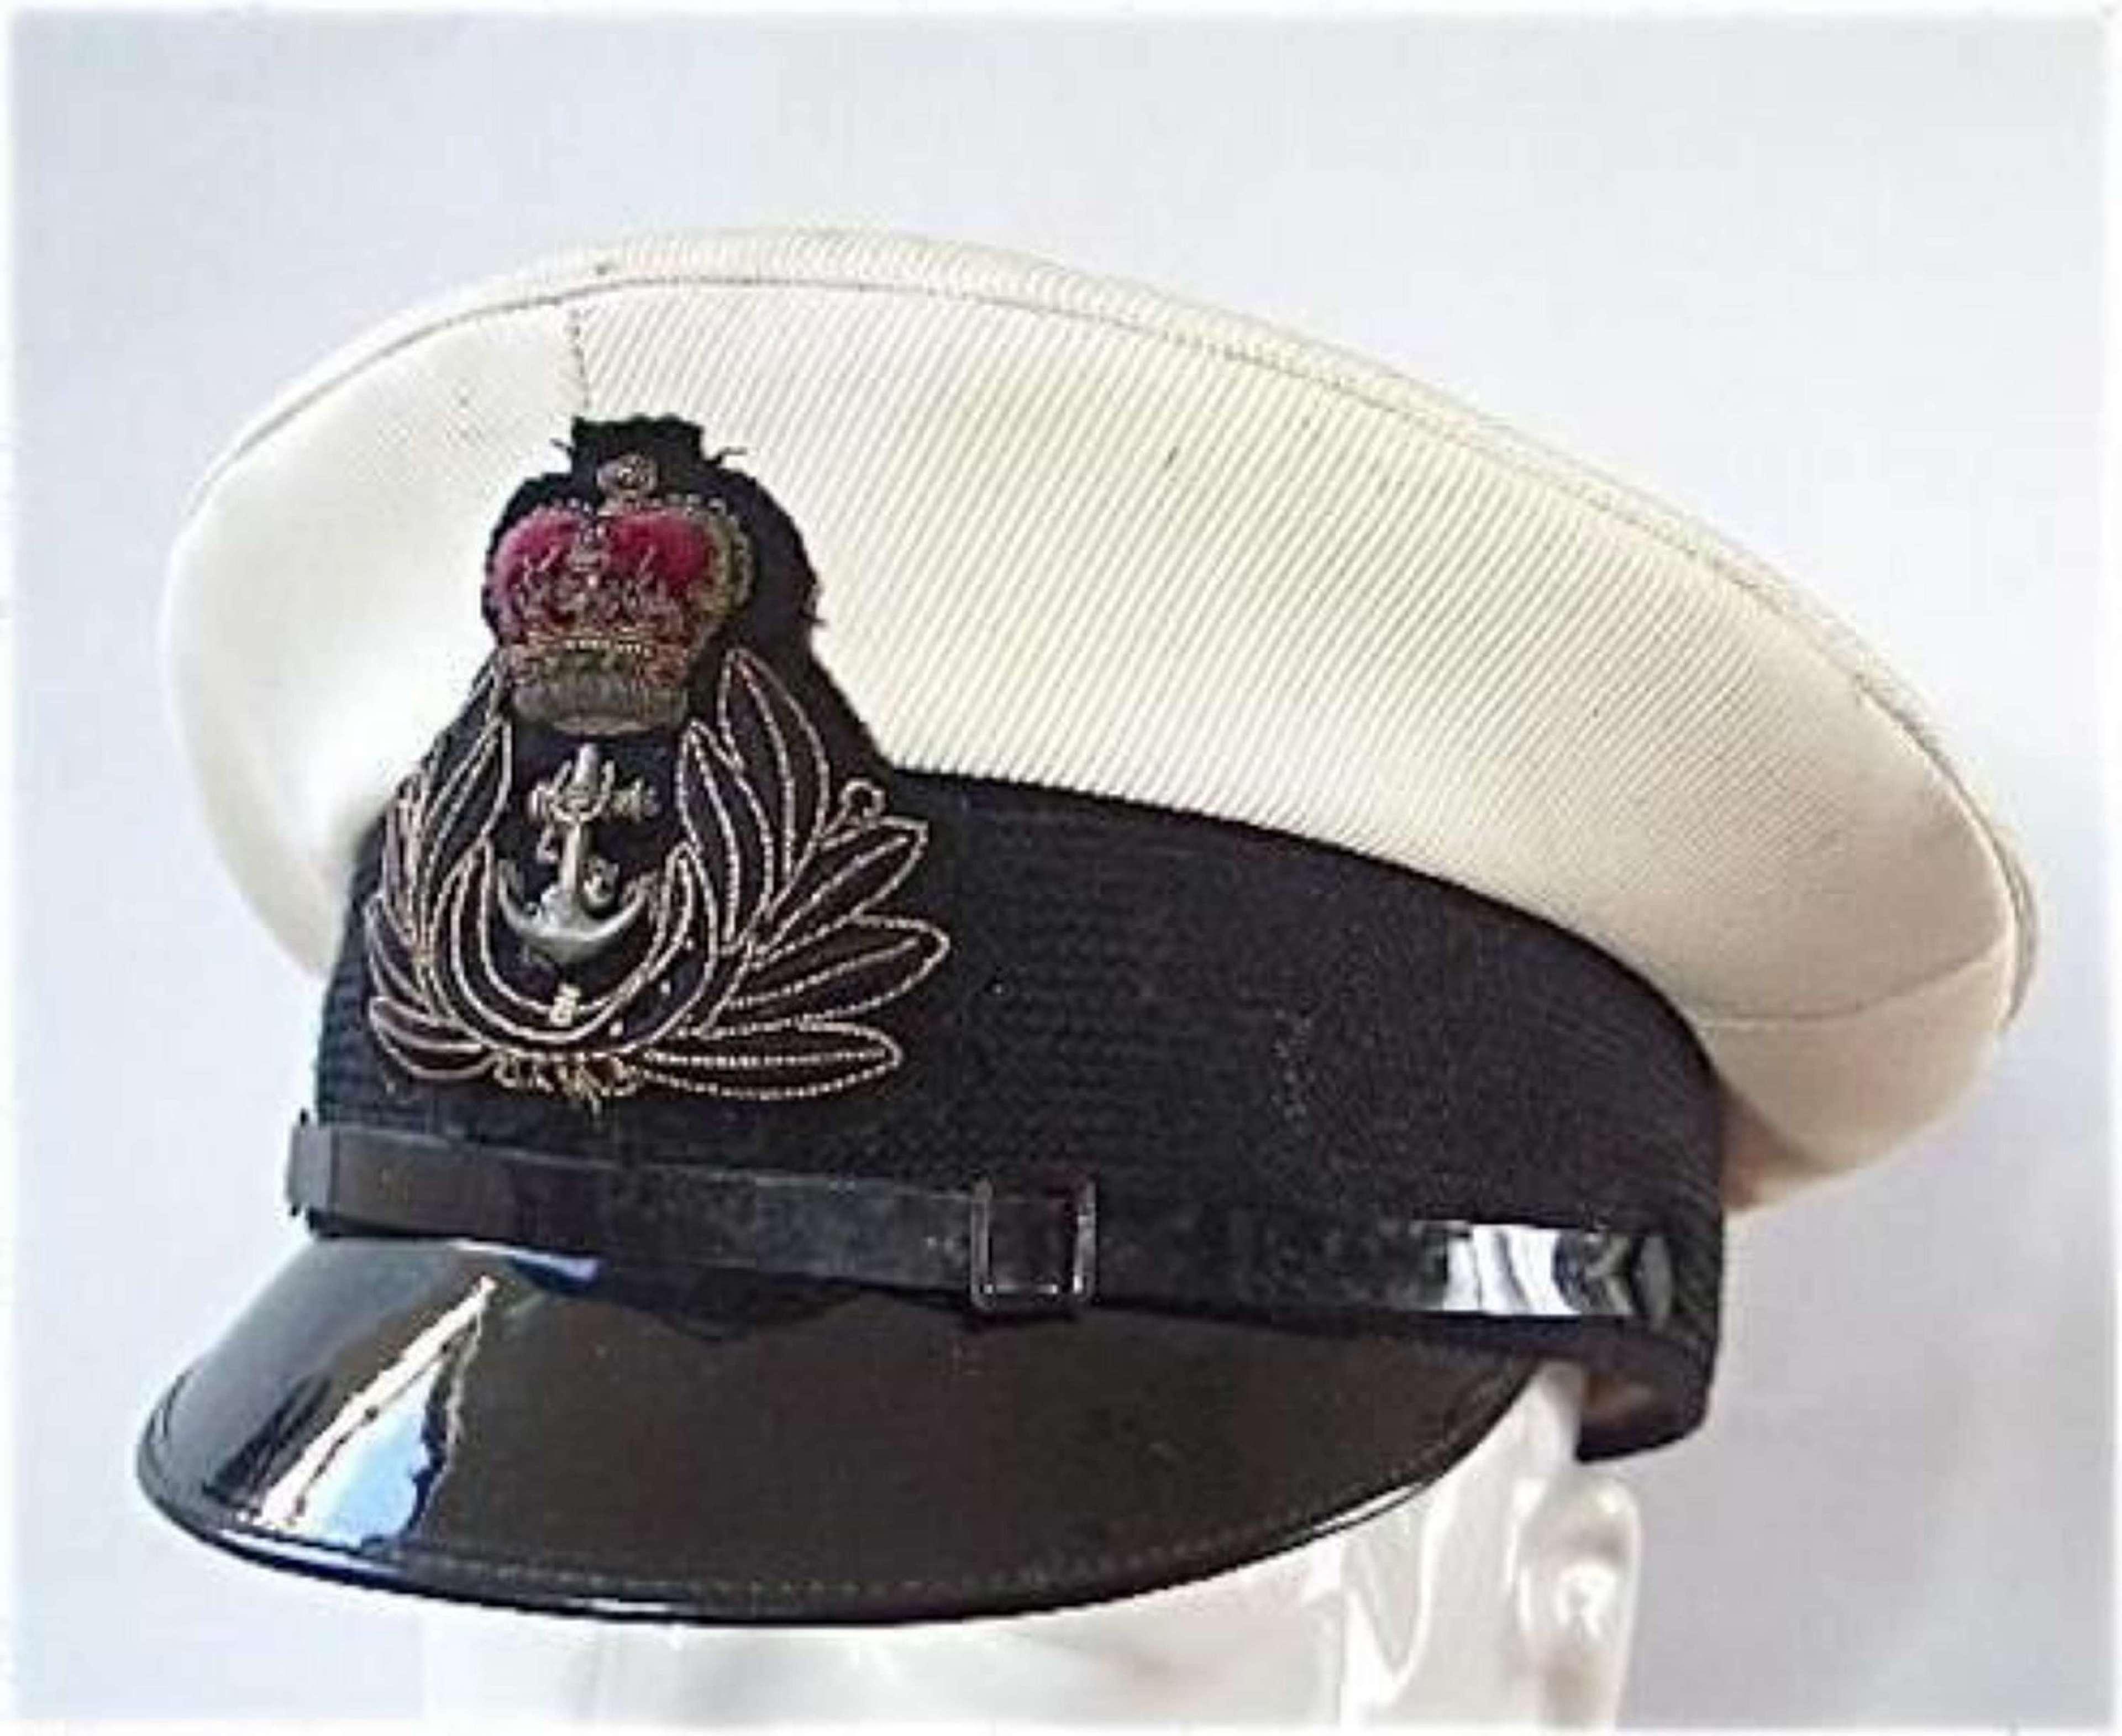 Royal Navy Chaplains Department Officers Cap.